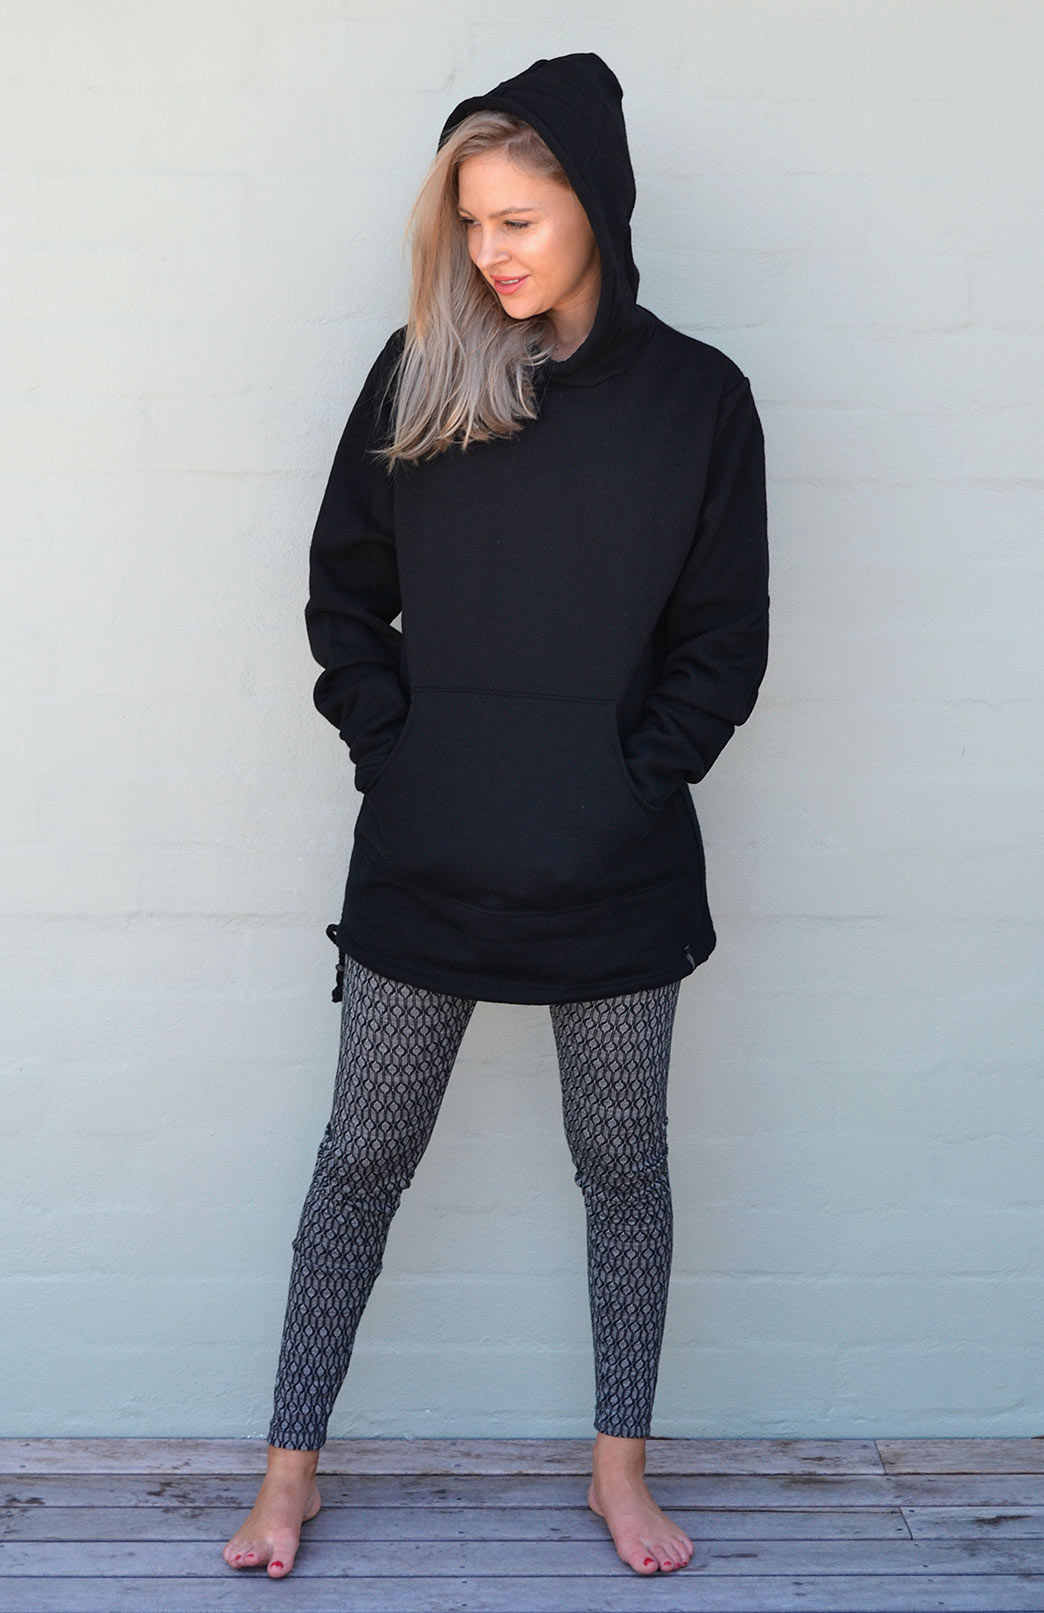 Wool Fleece Hoody (~350g) - Women's Black Wool Fleece Hoody Jacket with ties and kangaroo pocket - Smitten Merino Tasmania Australia